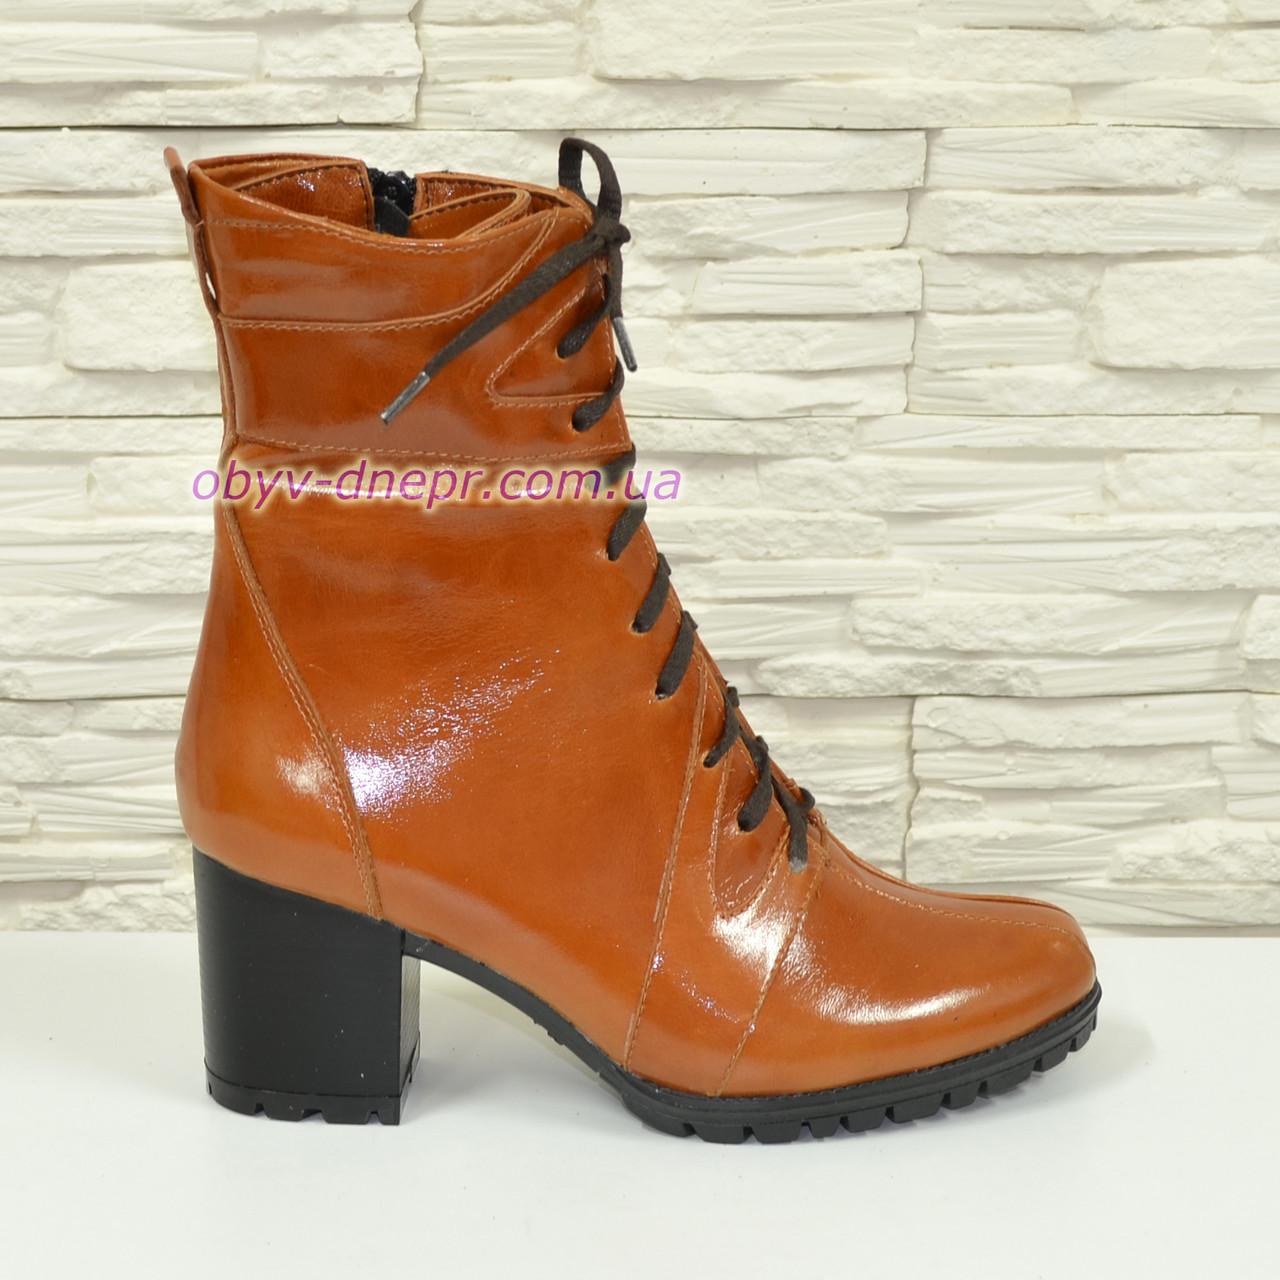 "Ботинки   кожаные рыжие на устойчивом каблуке. ТМ ""Maestro"""